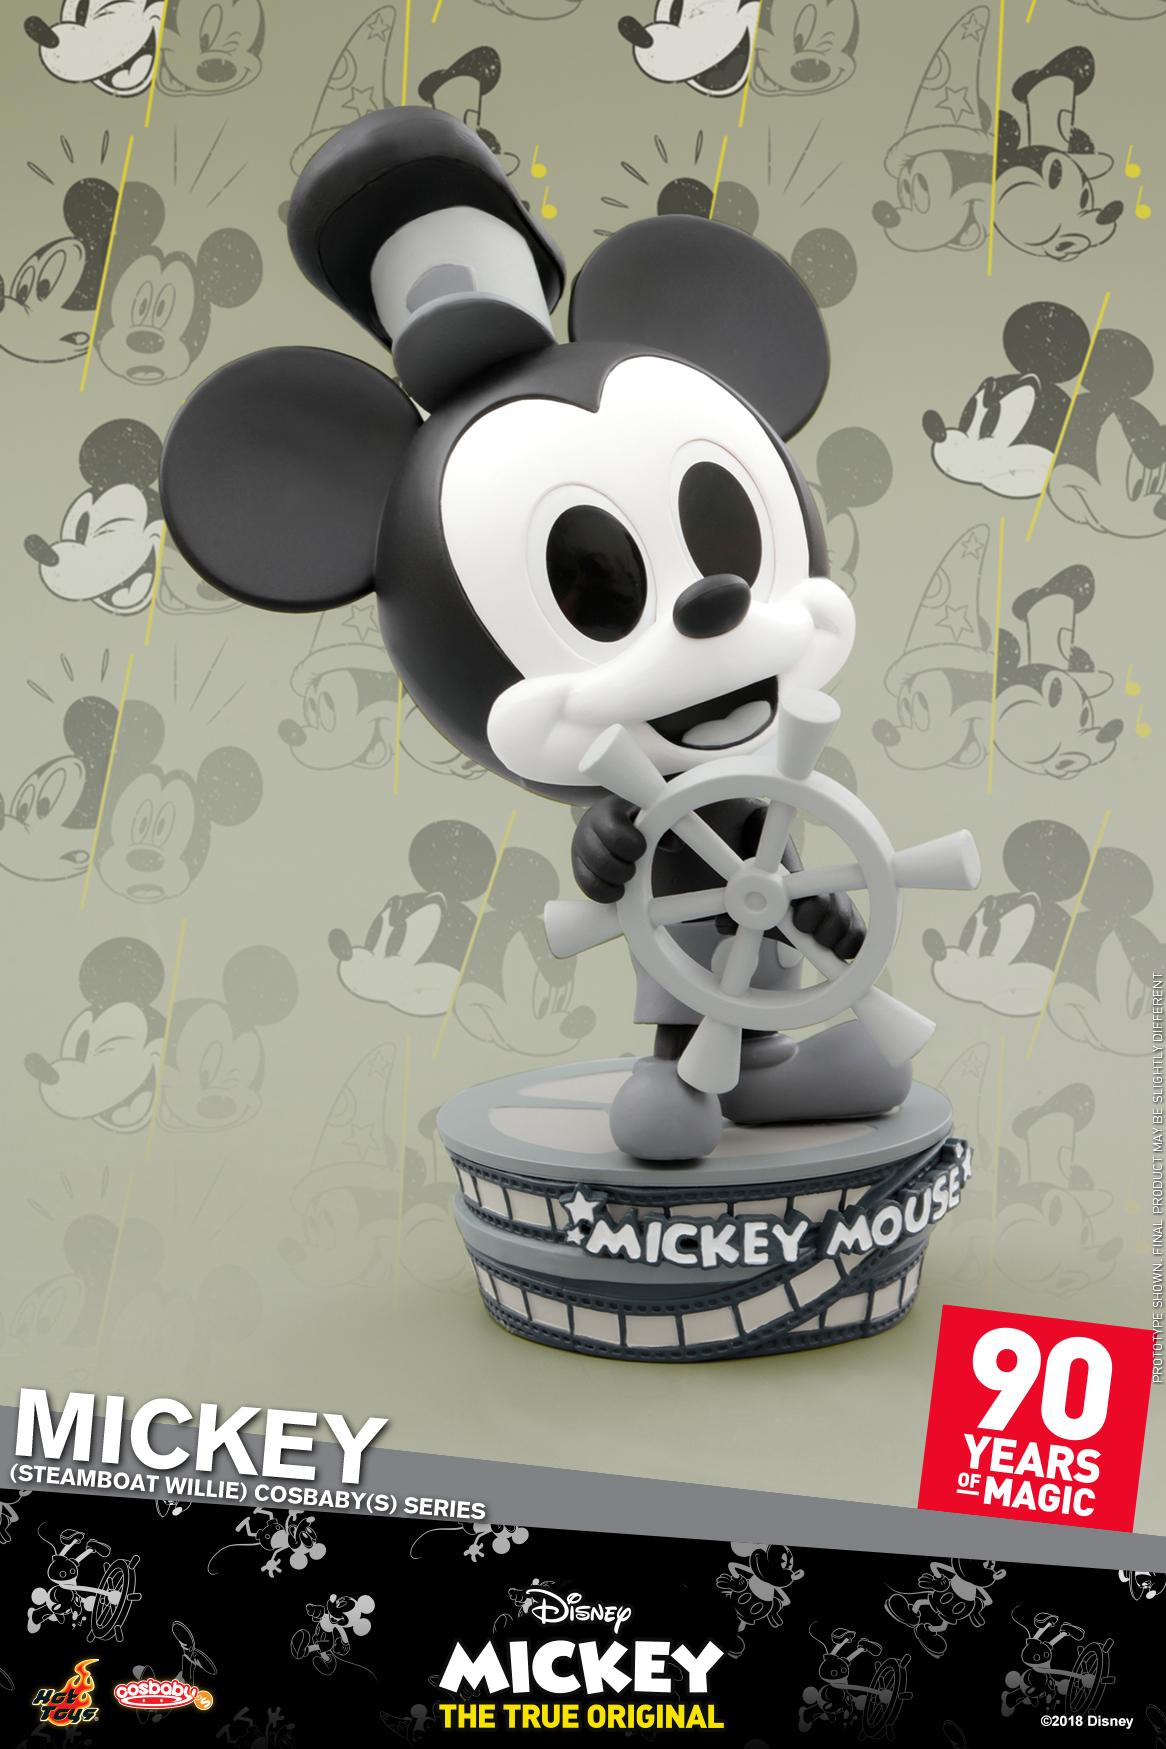 Mickey-(Steamboat-Willie)_V_03